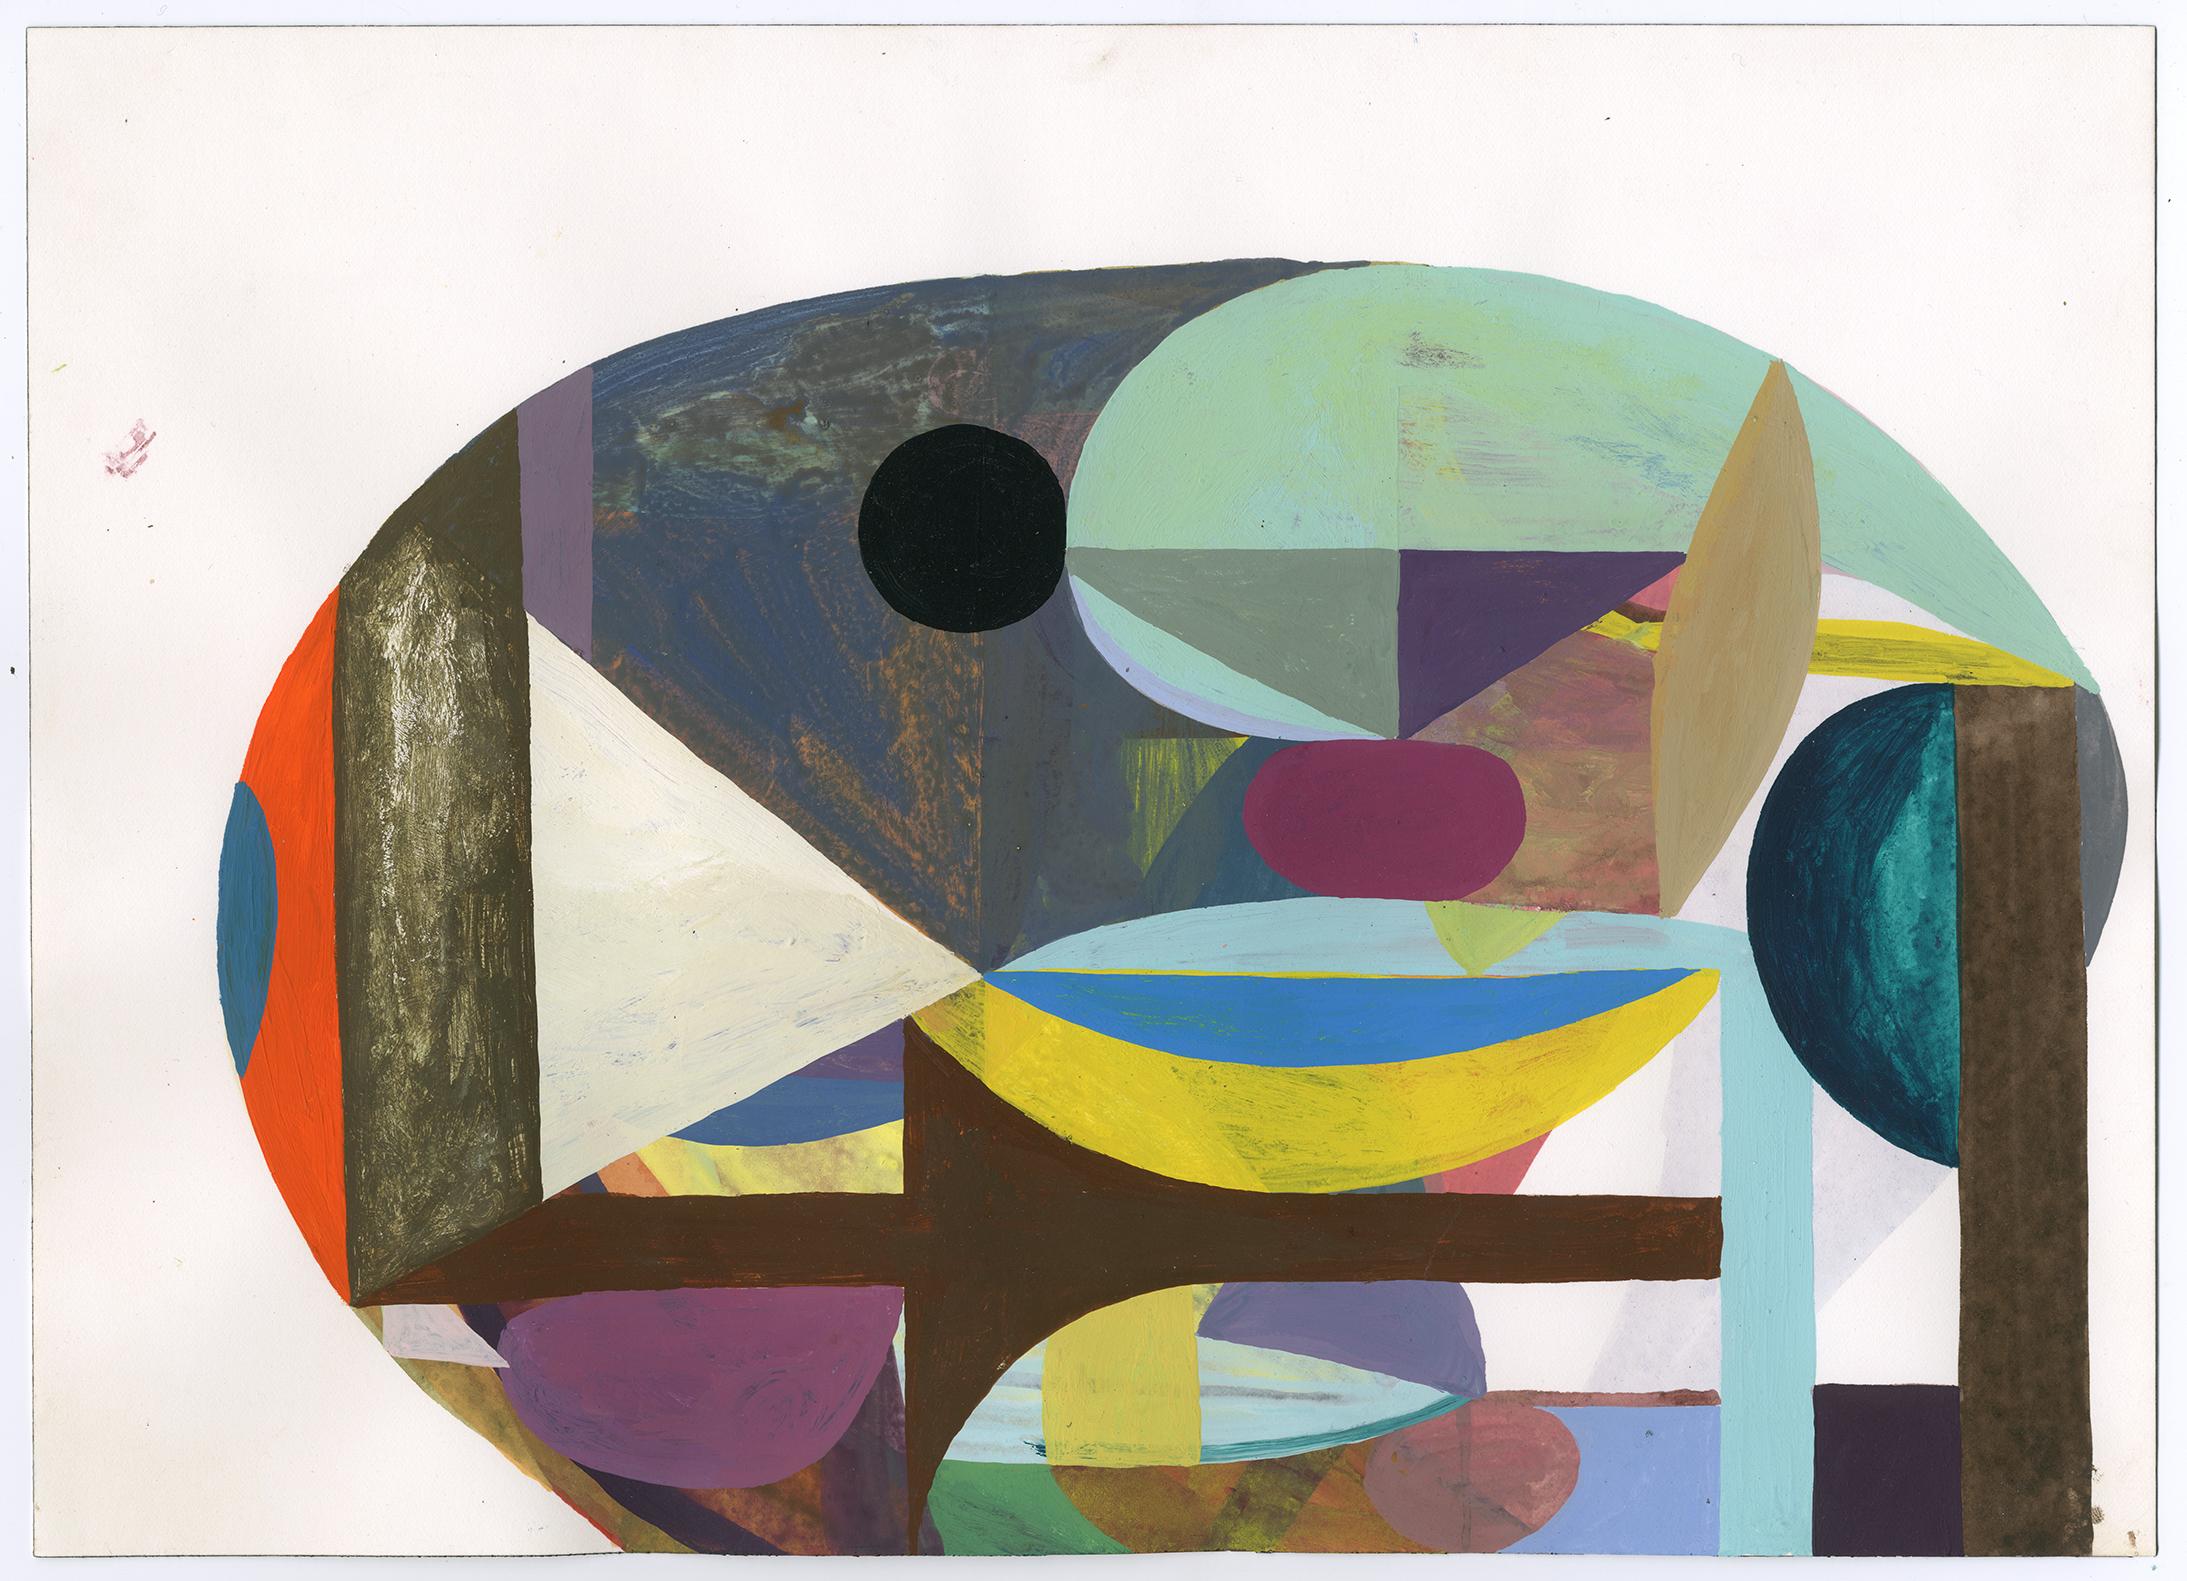 """Black Eye"" acryla gouache on paper, 10 x 14 inches, 2014"